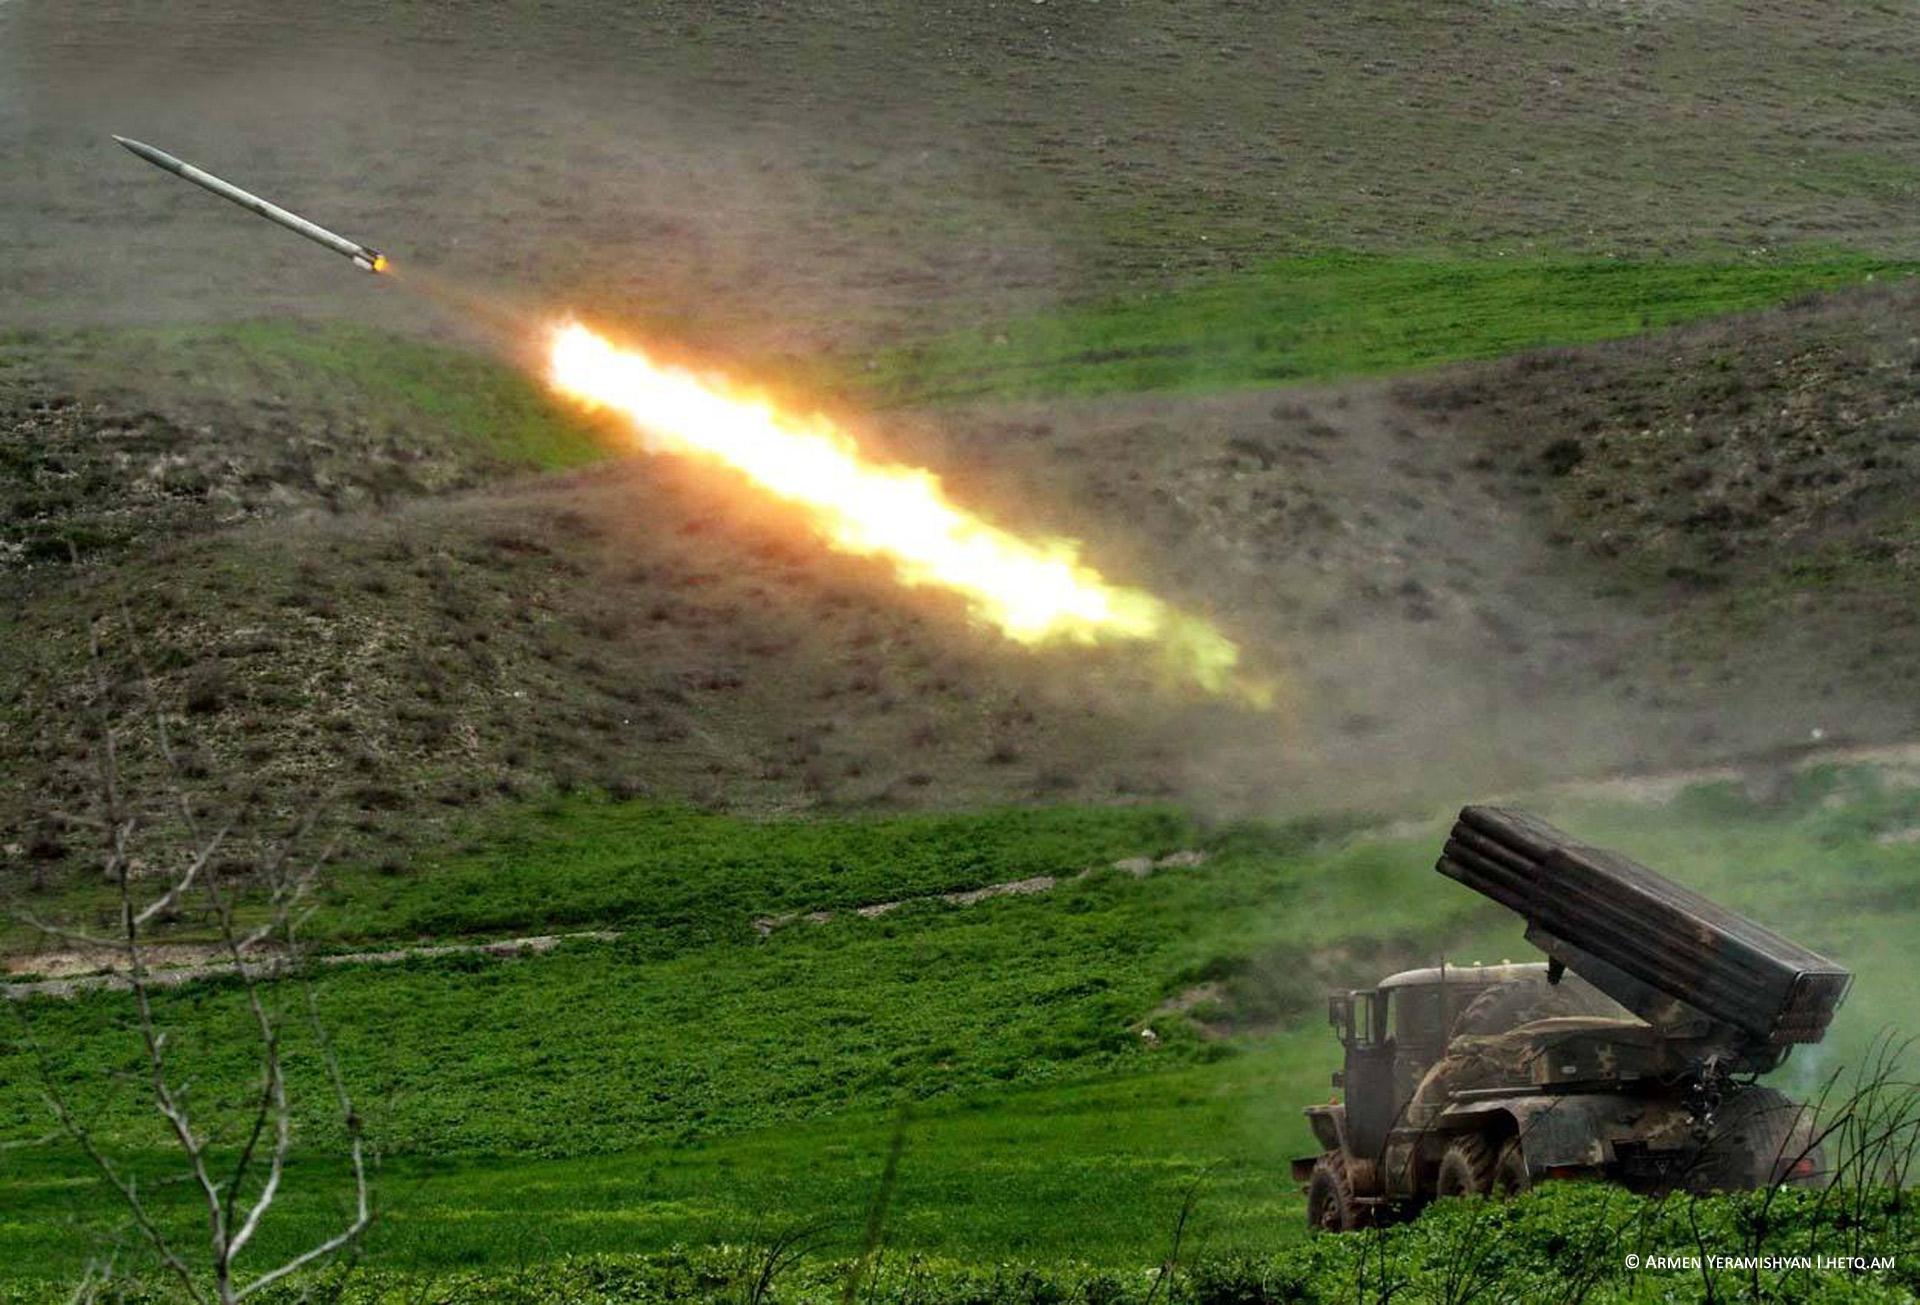 AraratNews - Նյարդերից թույլ անձանց խորհուրդ չի տրվում դիտել. ադրբեջանական հարձակումը ձախողվել է